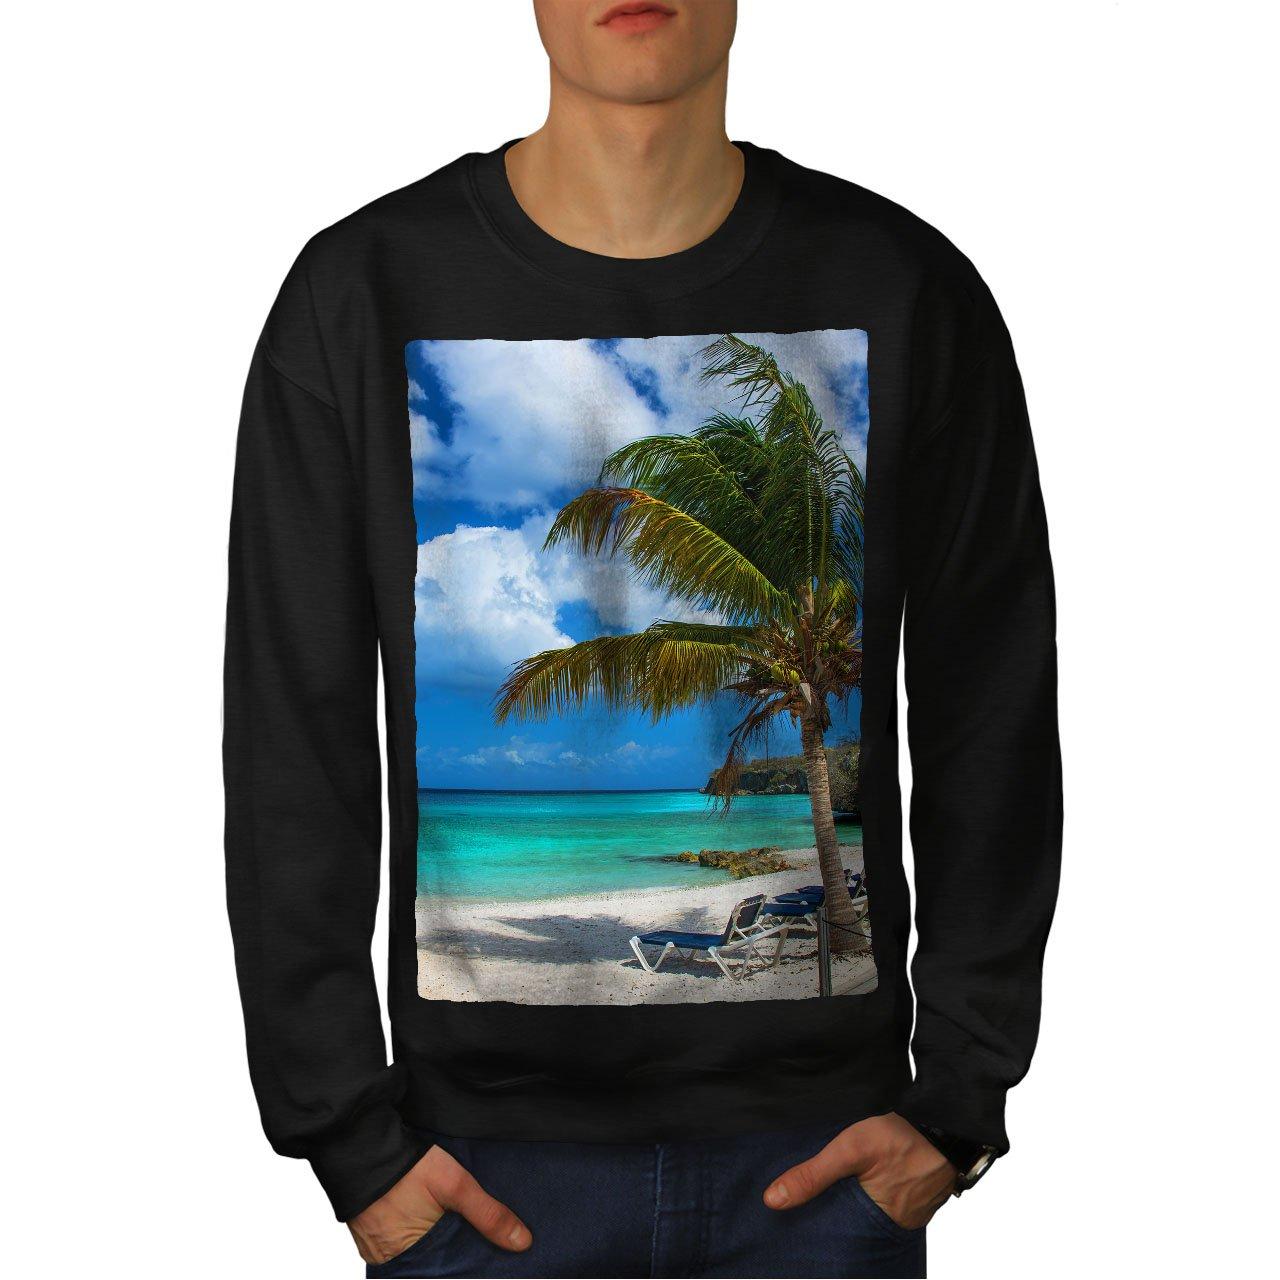 wellcoda Palm Tree Sunny Beach Mens Sweatshirt Lounger Casual Jumper